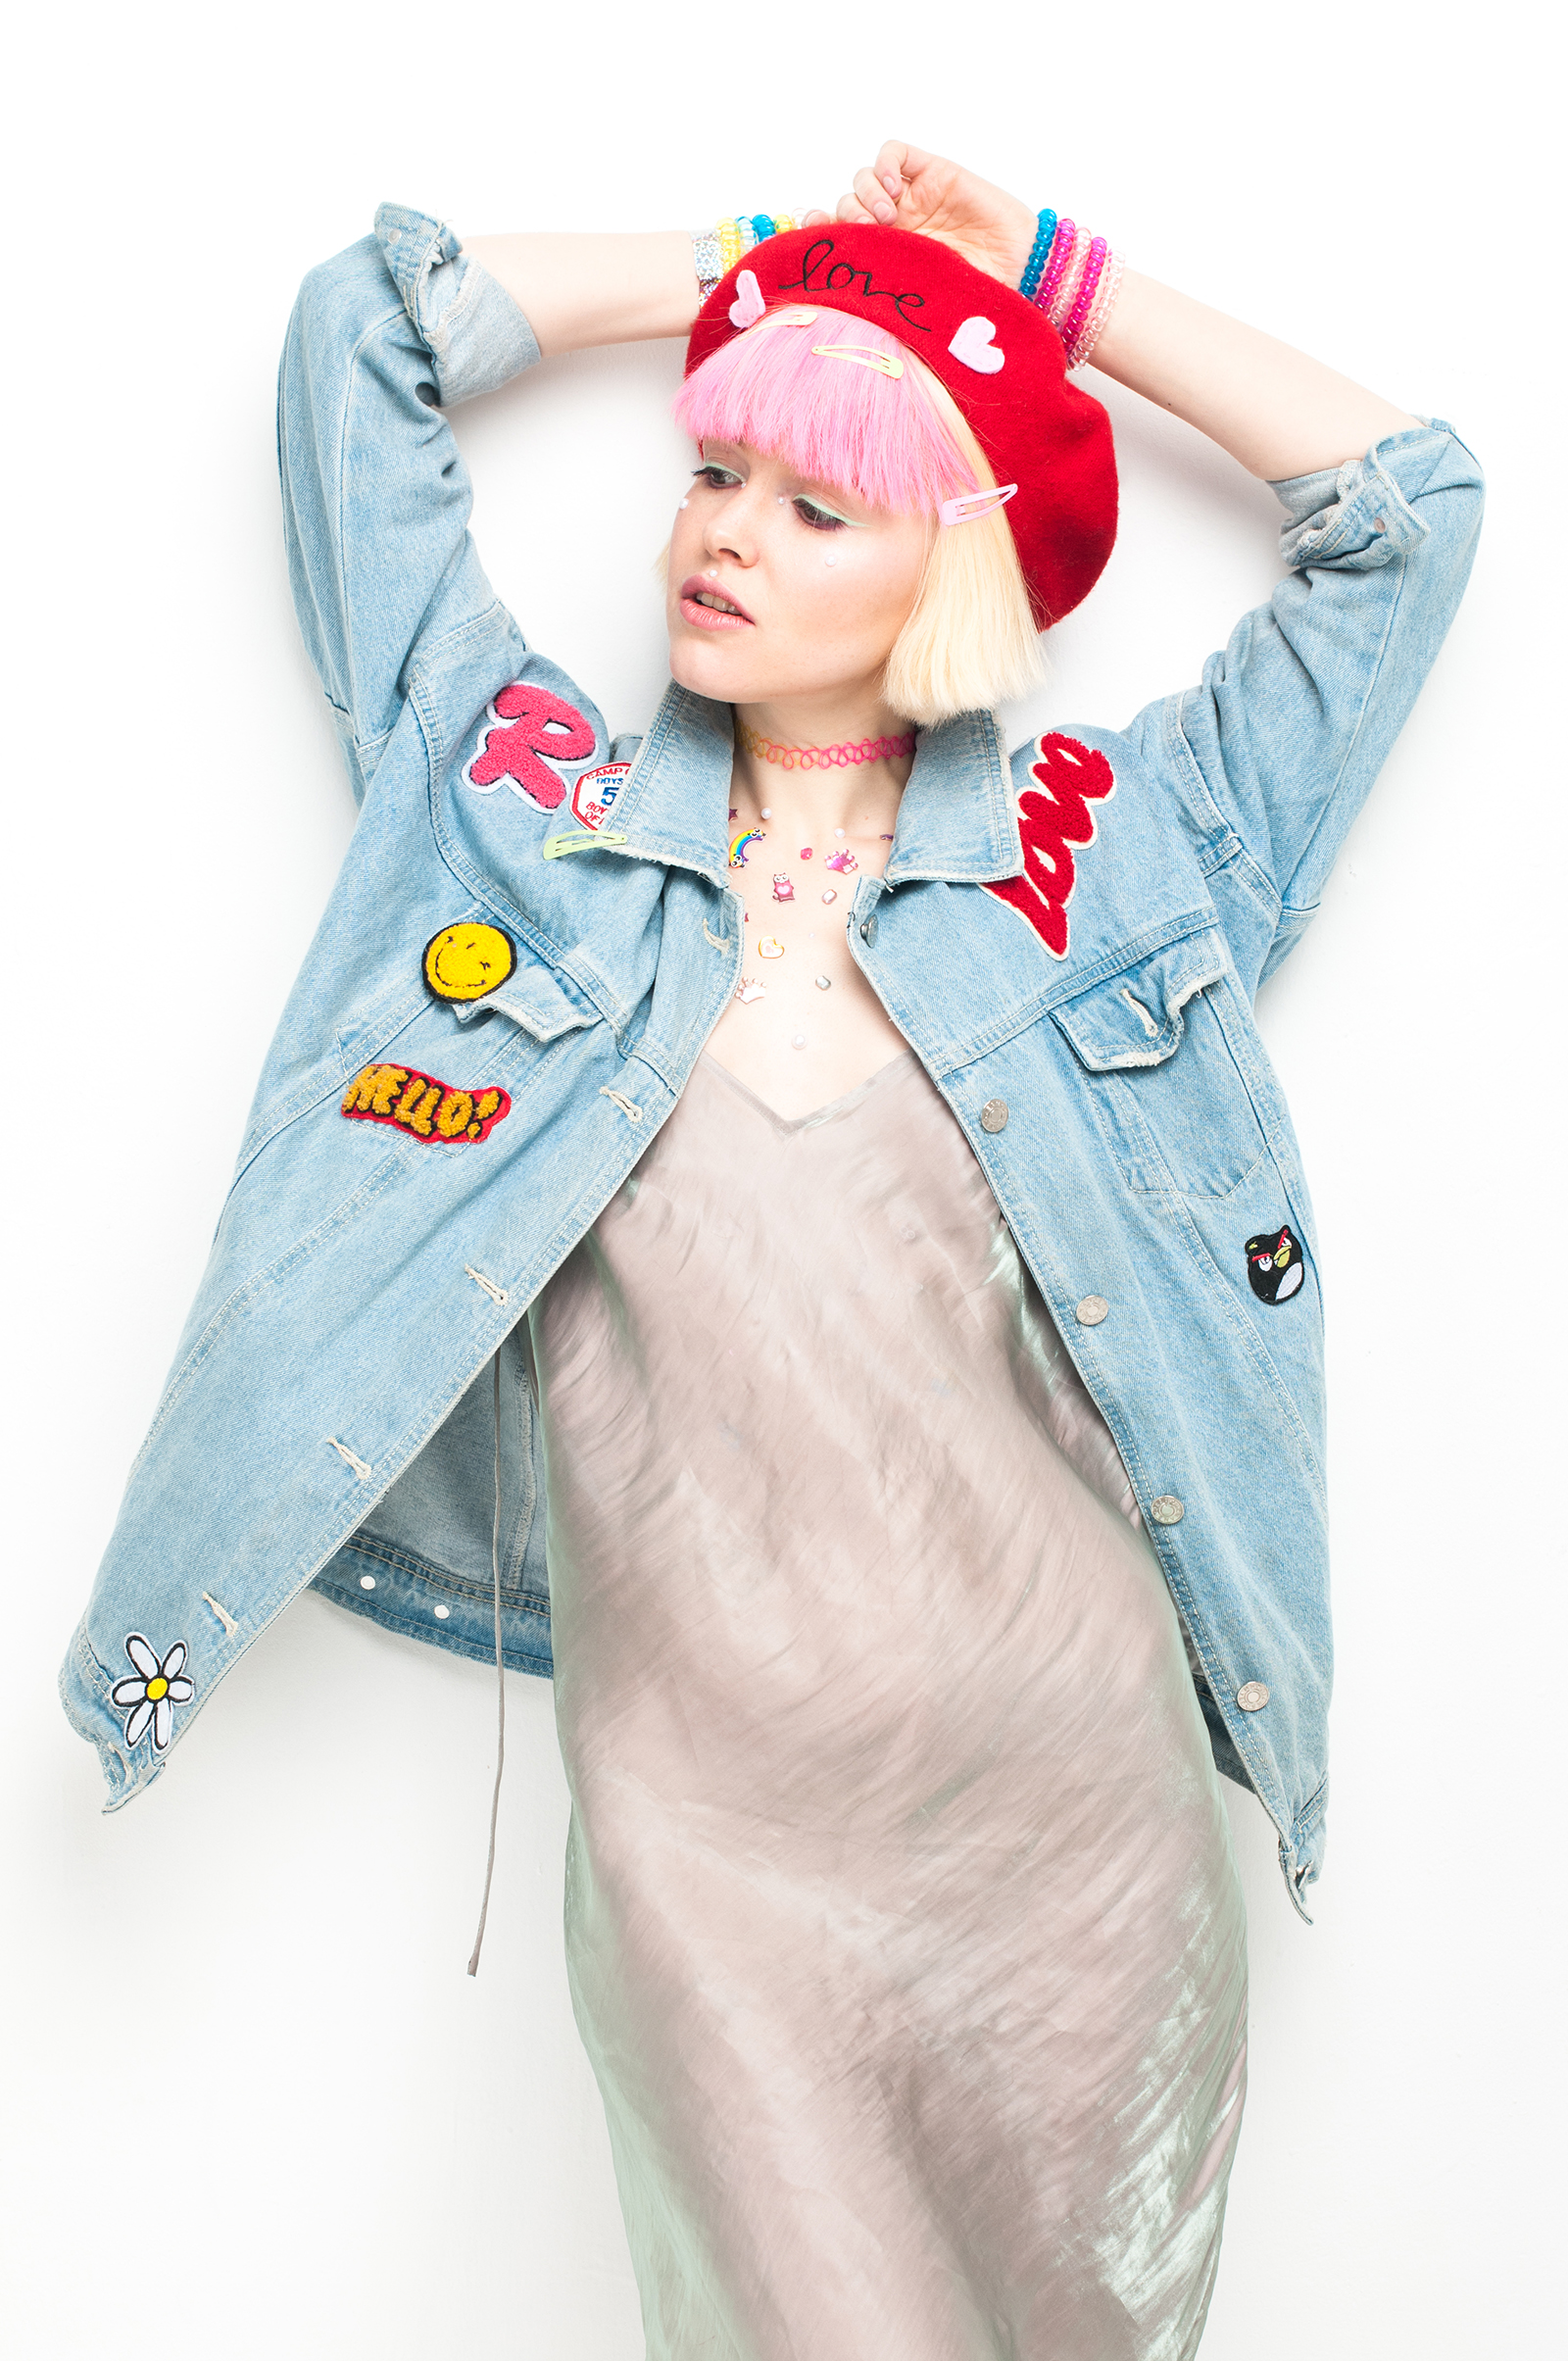 Denim jacket: #LenaGolova Dress: H&M Beret: #LenaGolova Choker: Accessorize